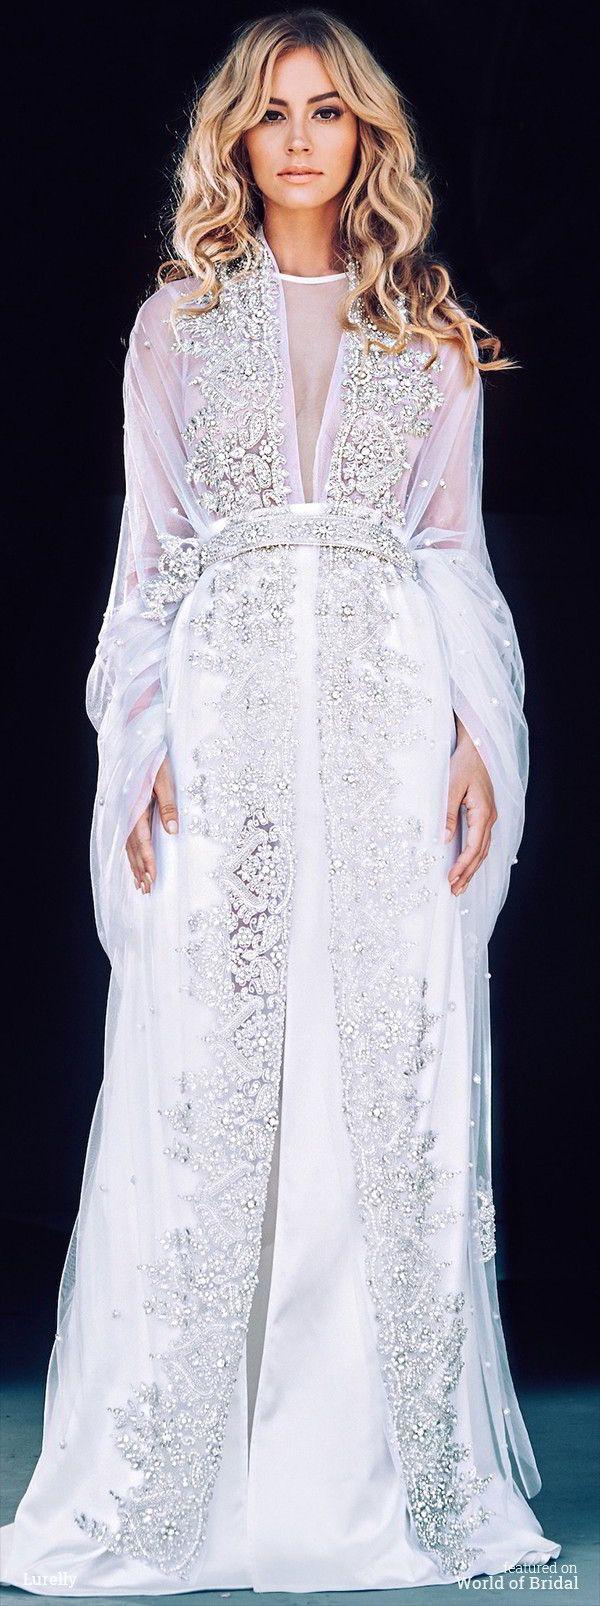 Lurelly 2016 Wedding Dresses | Pinterest | 2016 wedding dresses ...